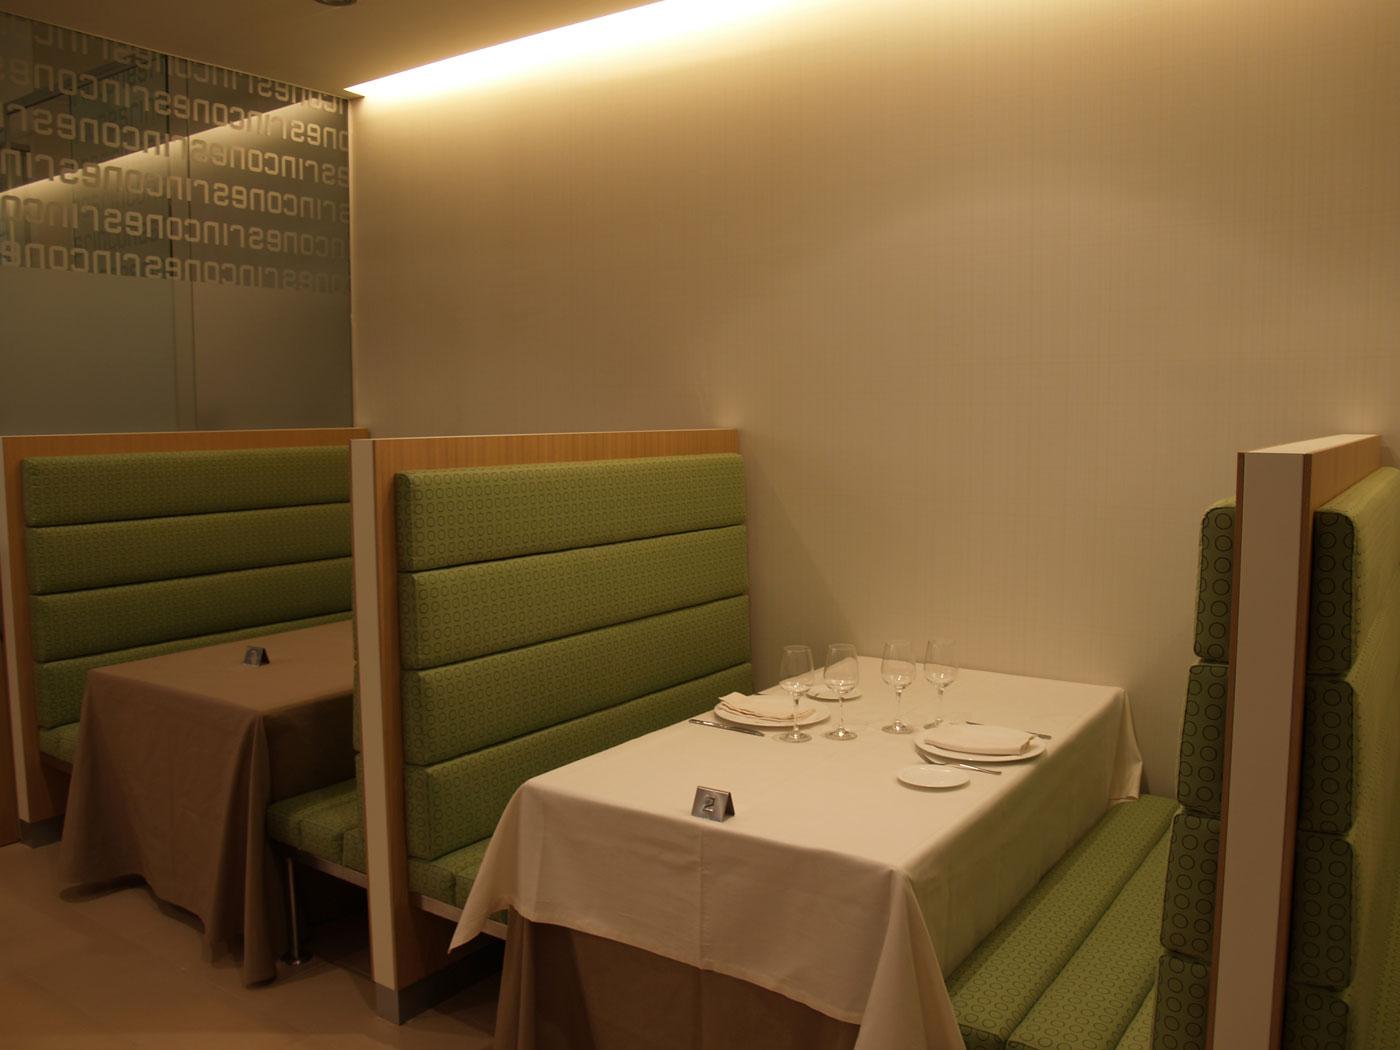 equipotres14 Mobiliario de oficina, mobiliario para empresa, silla, mesa, carpinteria, ebanisteria, mobiliario de diseño, muebles a medida, mesas, sillas y contract 64